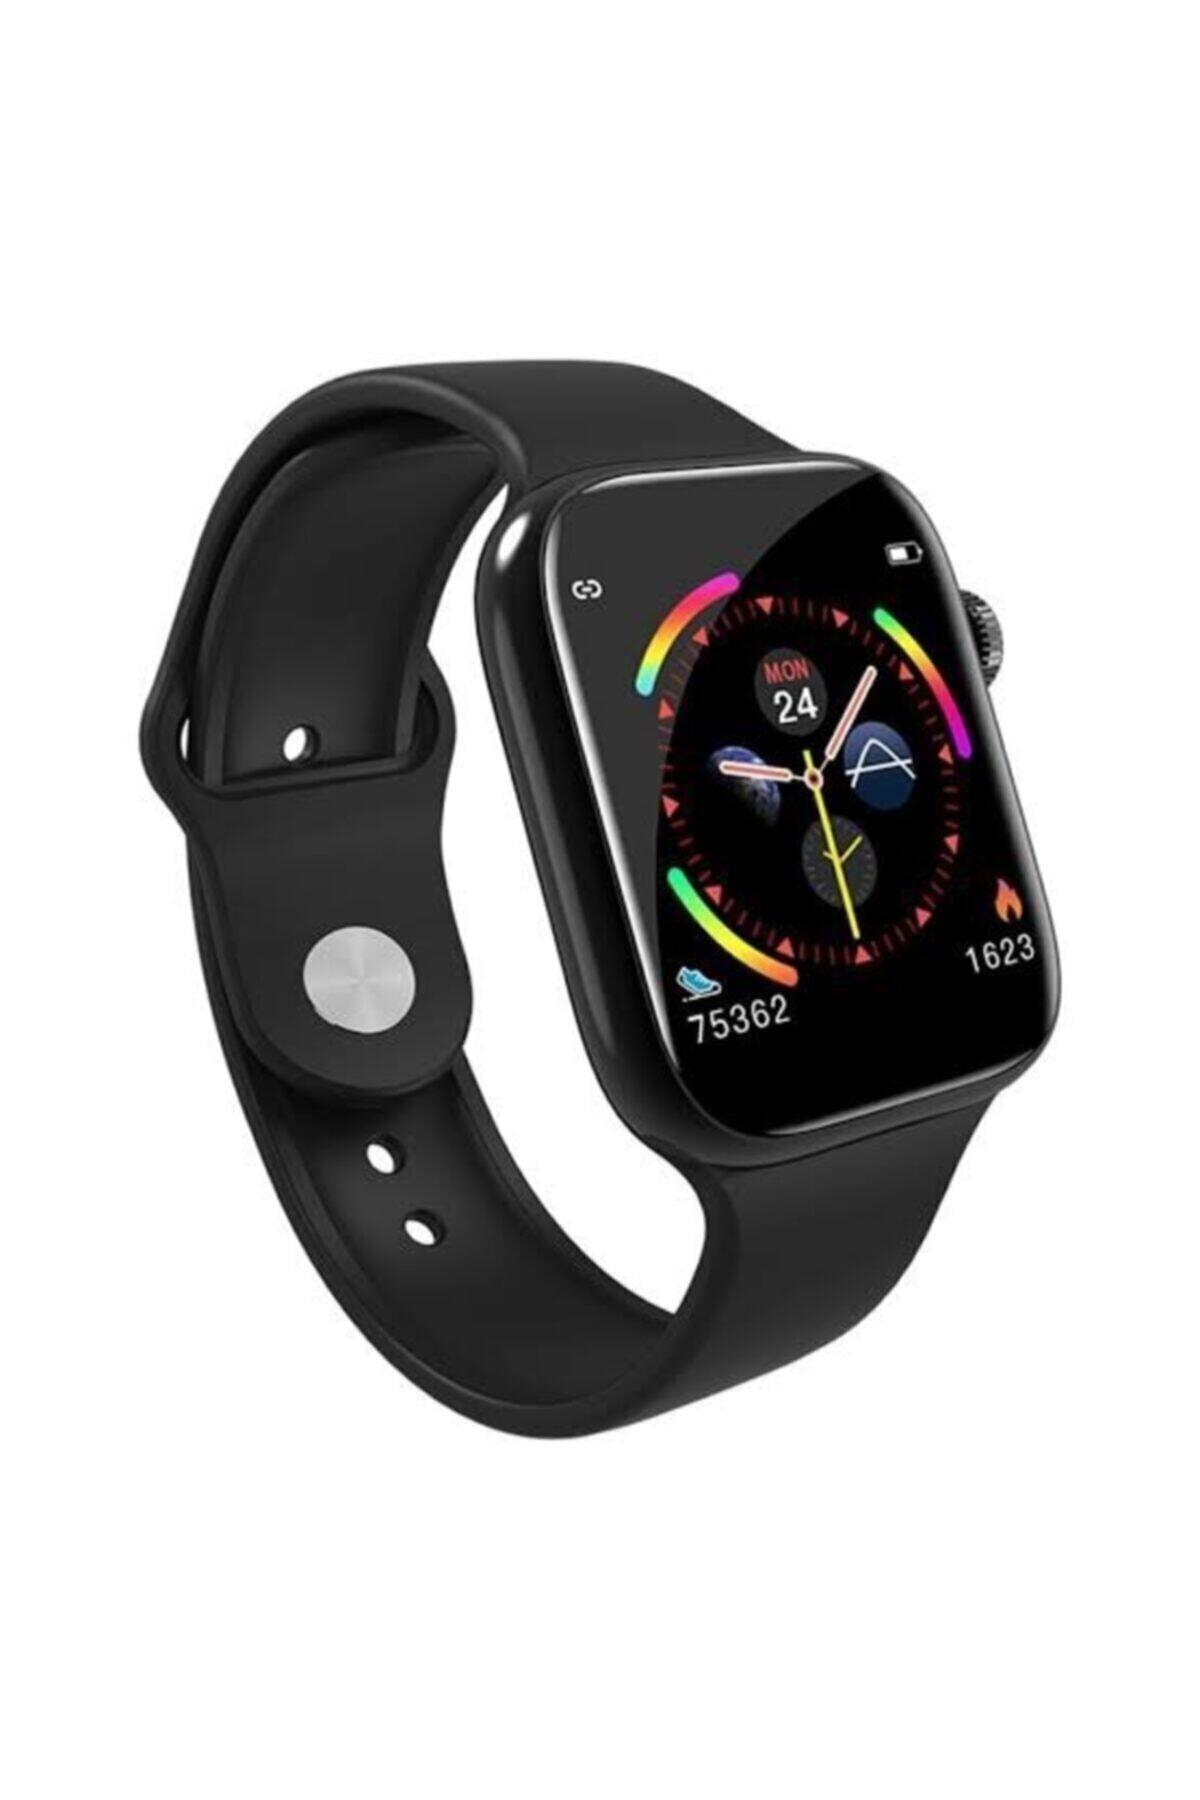 POLYGOLD W4 Akıllı Saat Smart Watch Dokunmatikli Ekran Adım Sayar 2